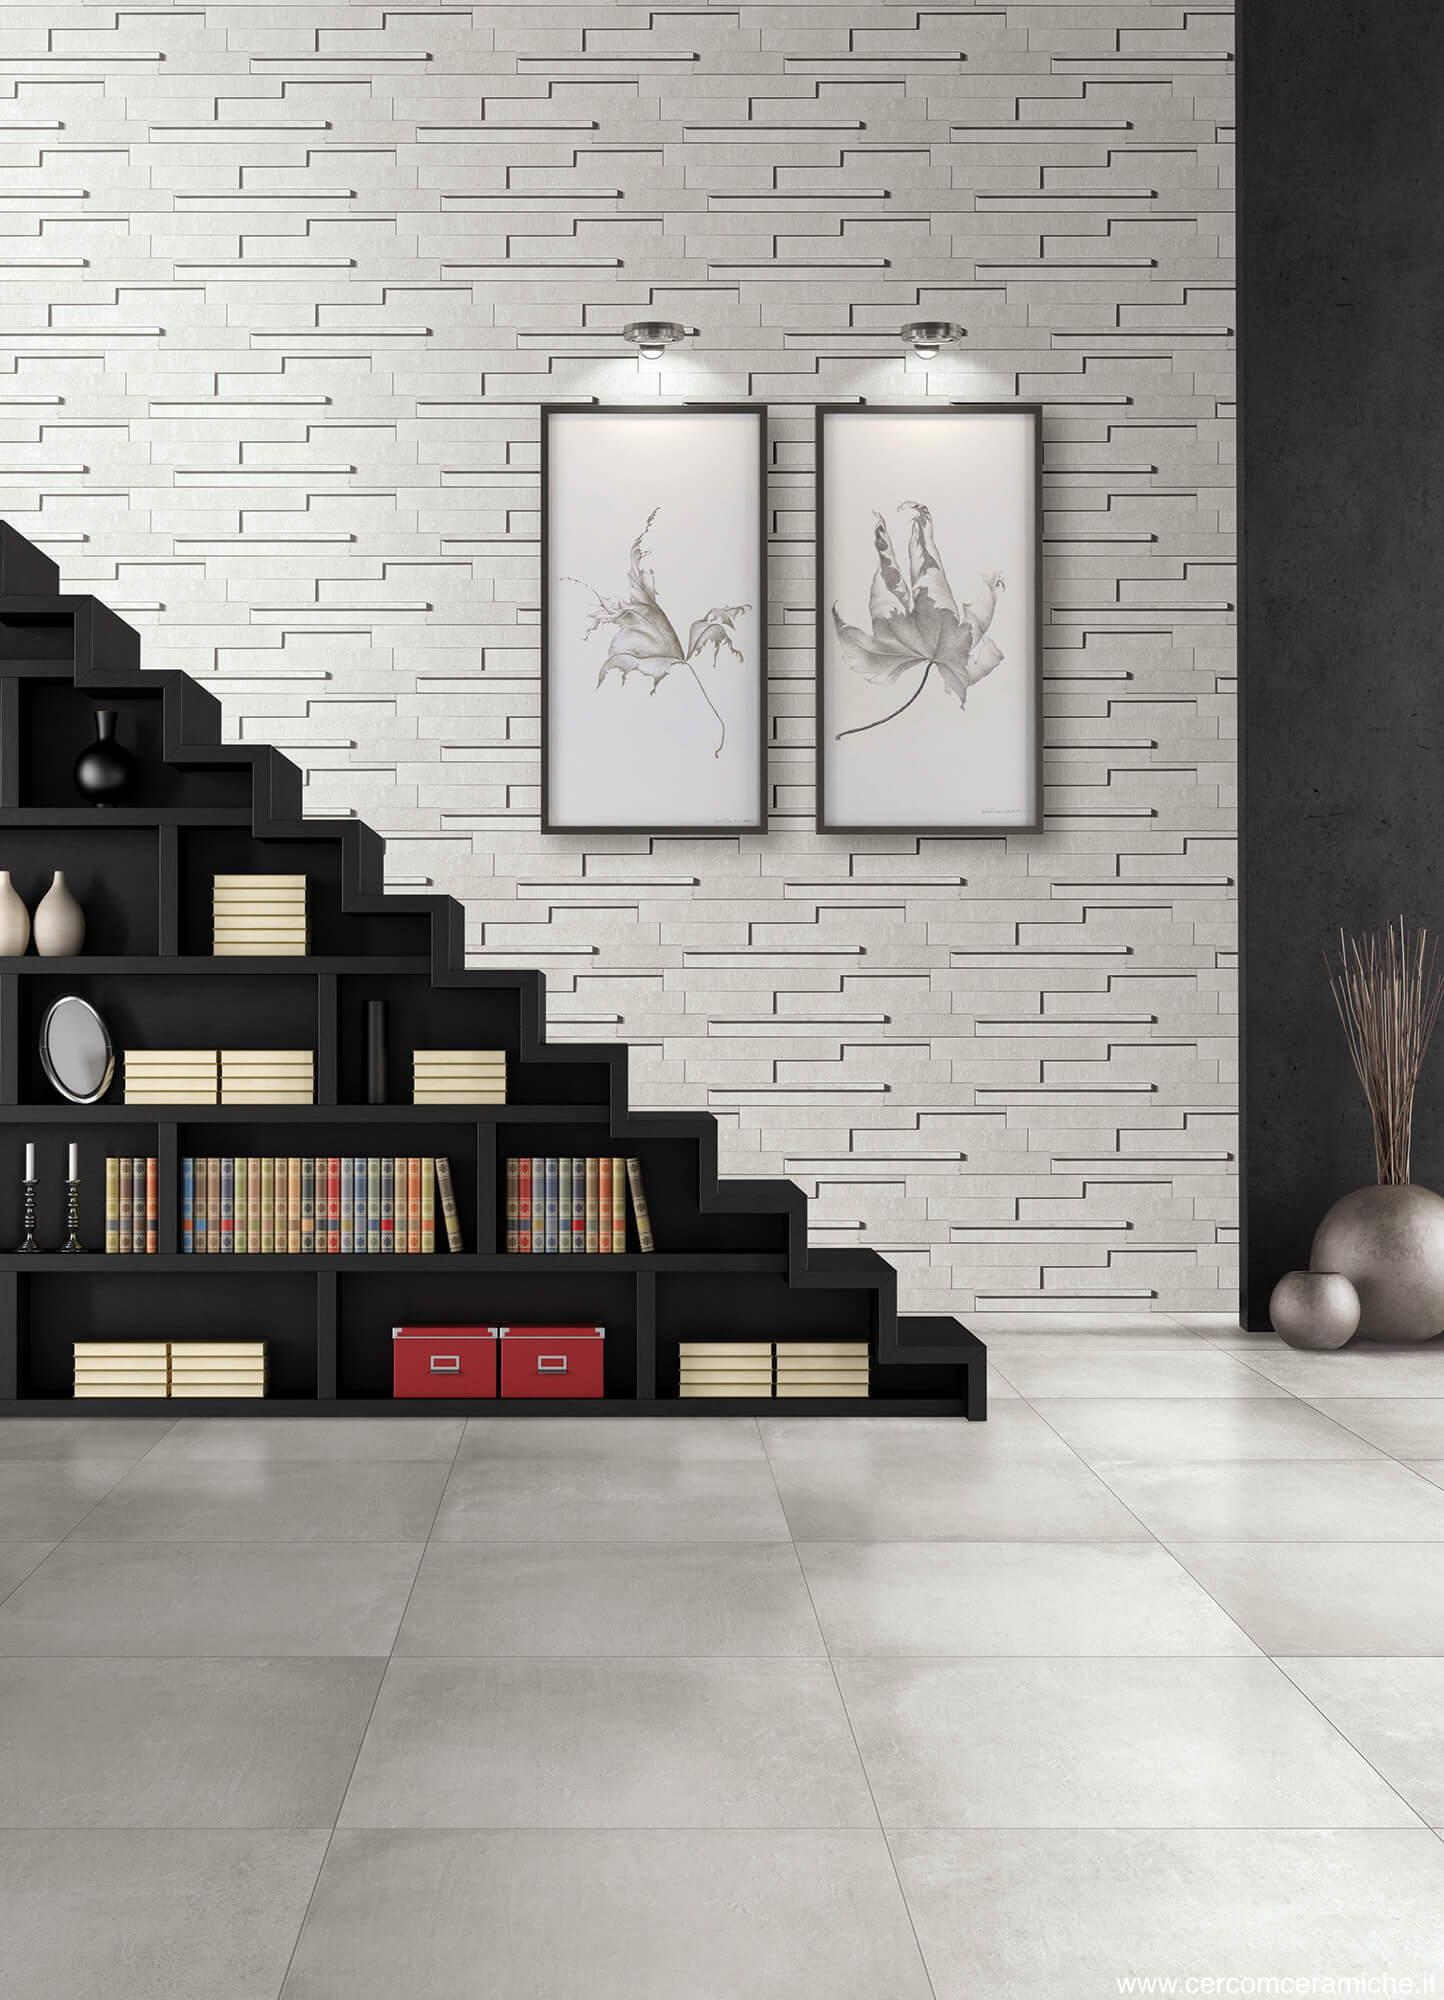 Kollektion: Gravity – Steinzeug In Betonoptik | Cercom Ceramiche avec Cercom Gravity Dust 80X80